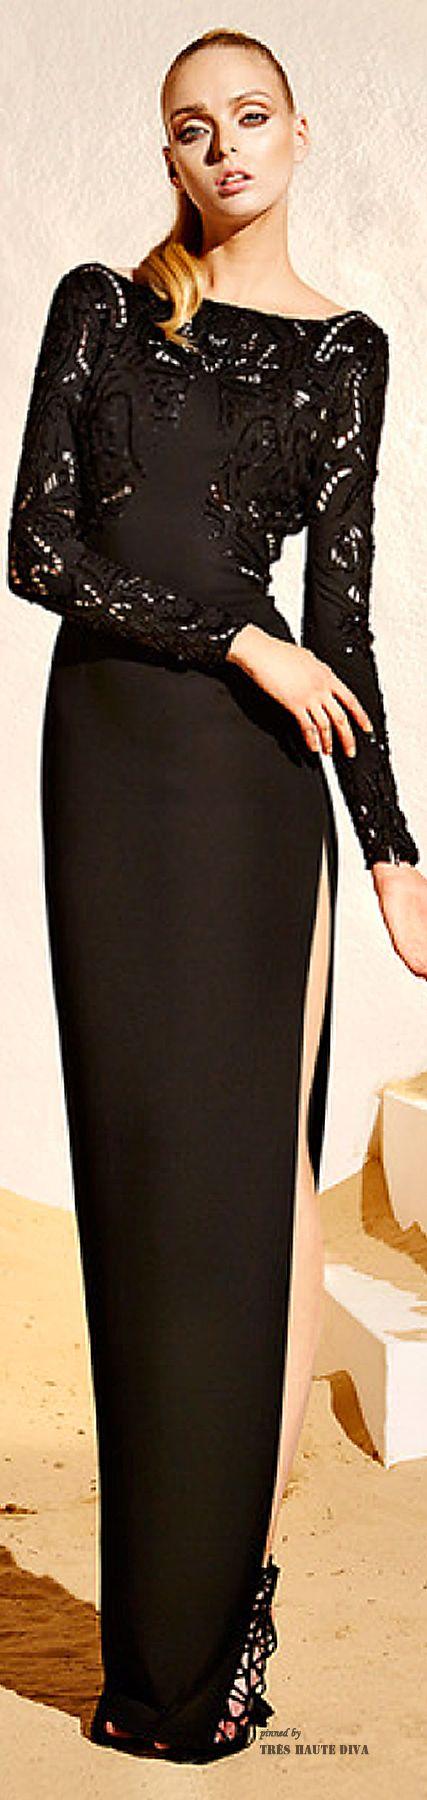 The Millionairess of Pennsylvania:  Stunning wardrobe of Zuhair Murad gowns Resort 2015